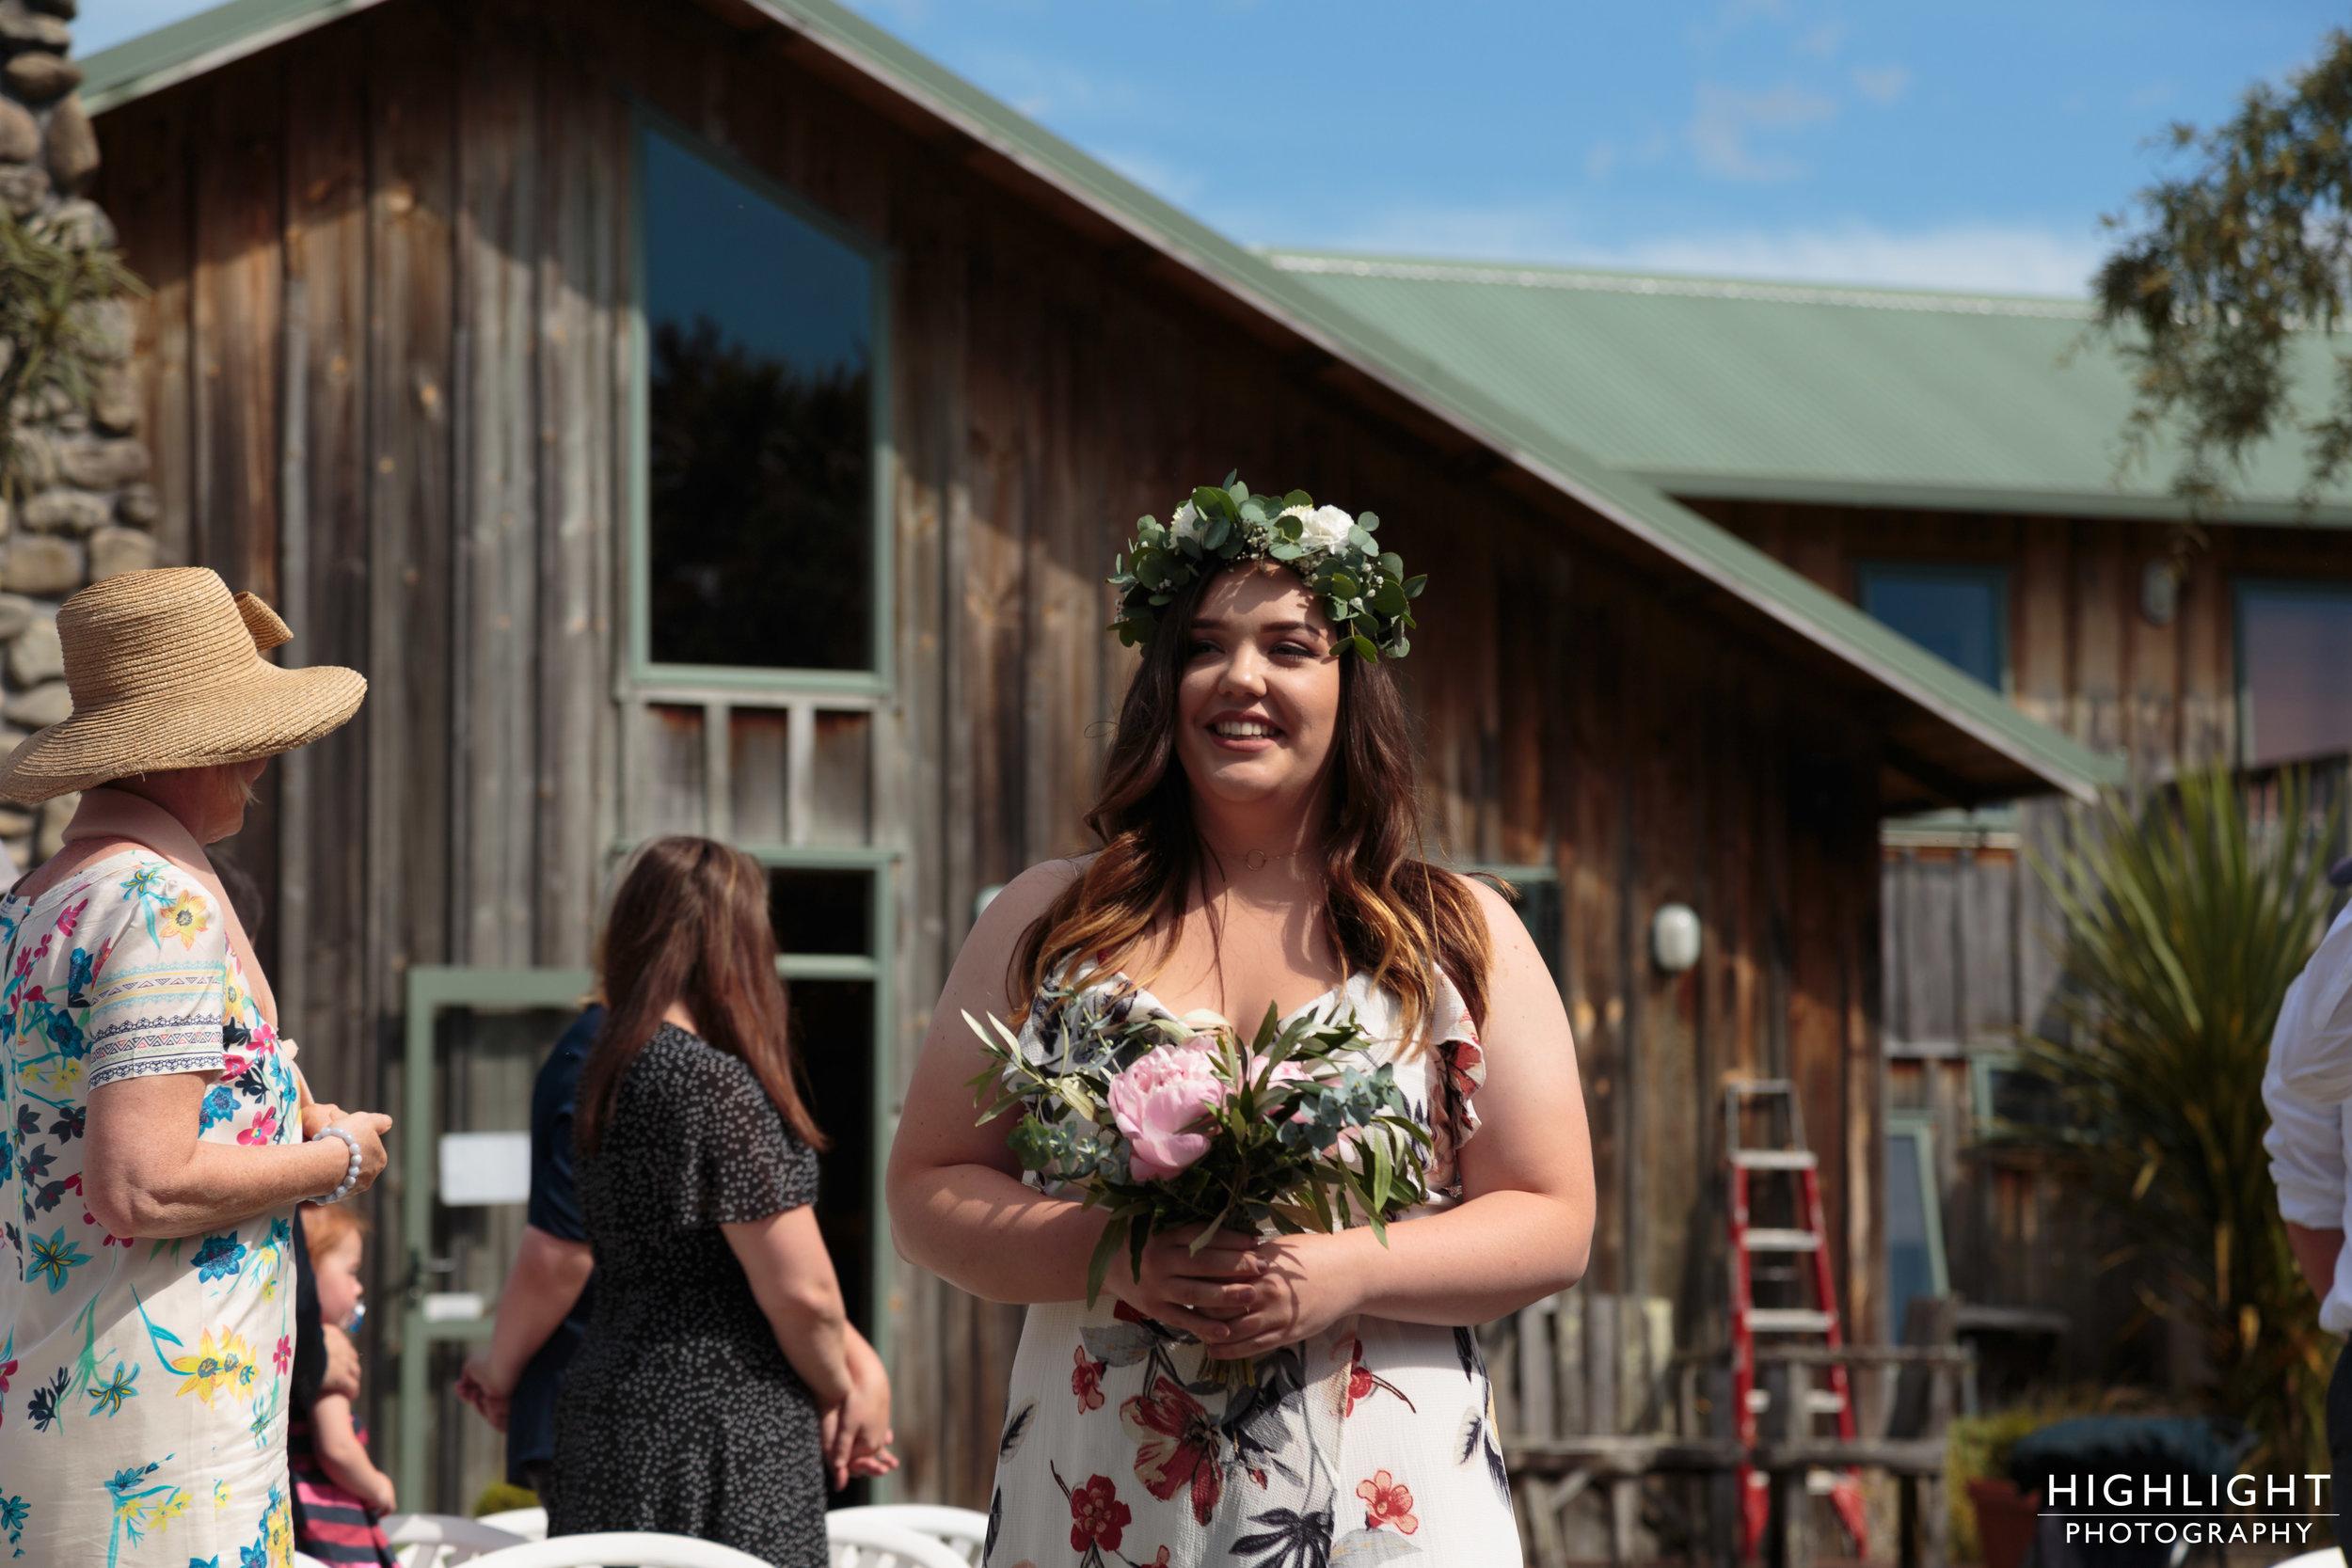 highlight-wedding-photography-new-zealand-makoura-lodge-wedding-47.jpg